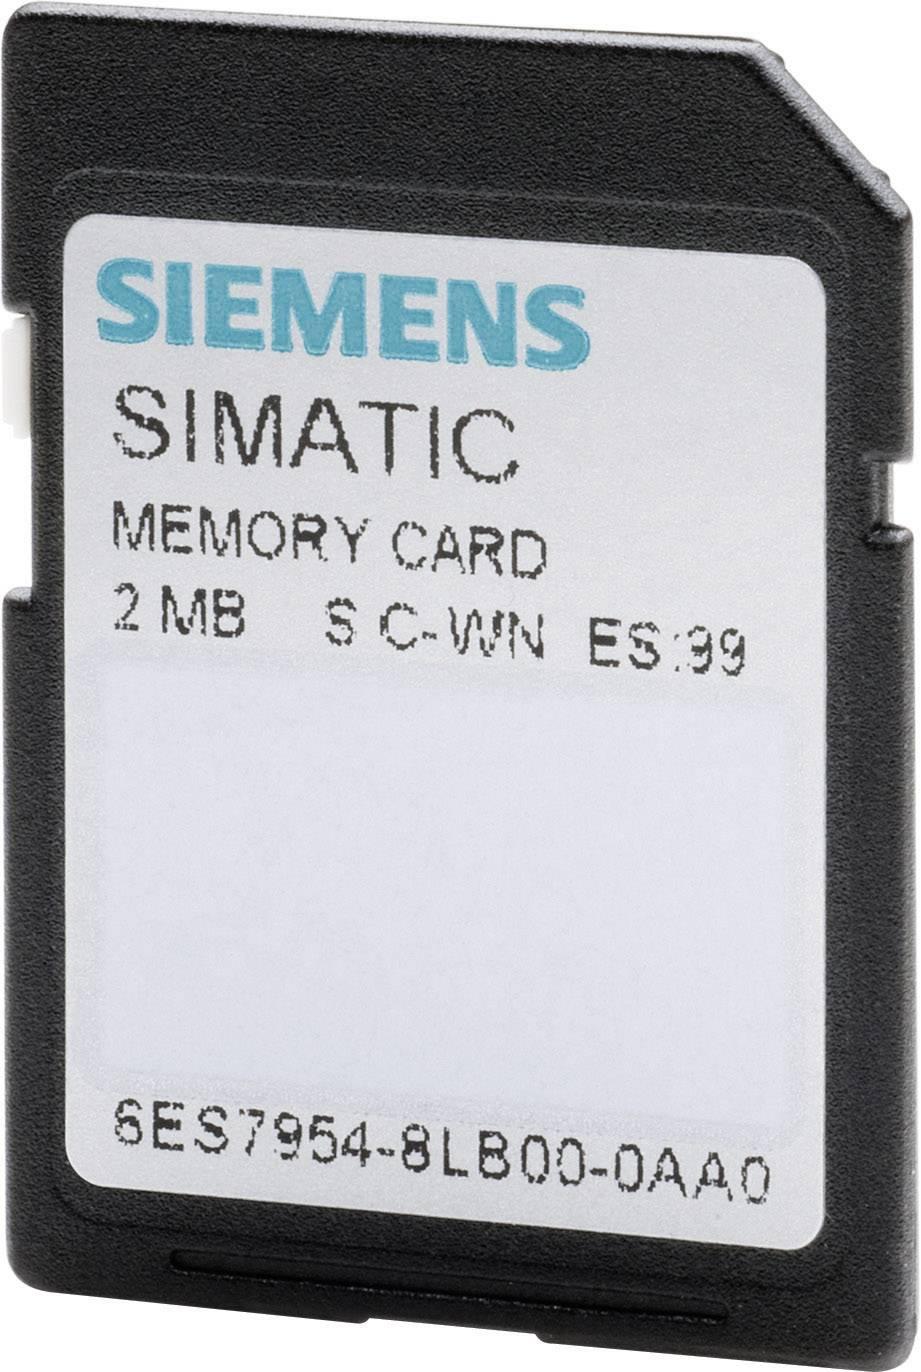 Pamäťovýmodul Siemens SIMATIC S7 Memory Card 6ES7954-8LC02-0AA0